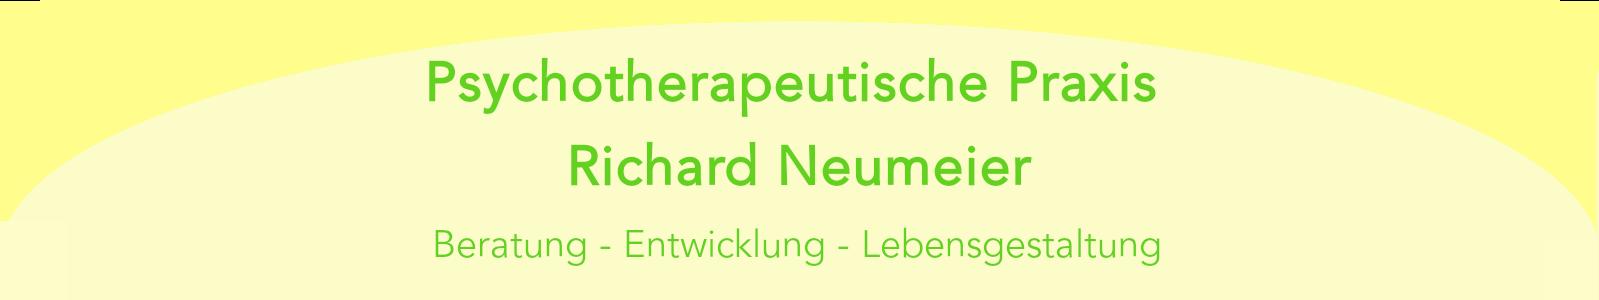 Psychotherapeutische Praxis Richard Neumeier